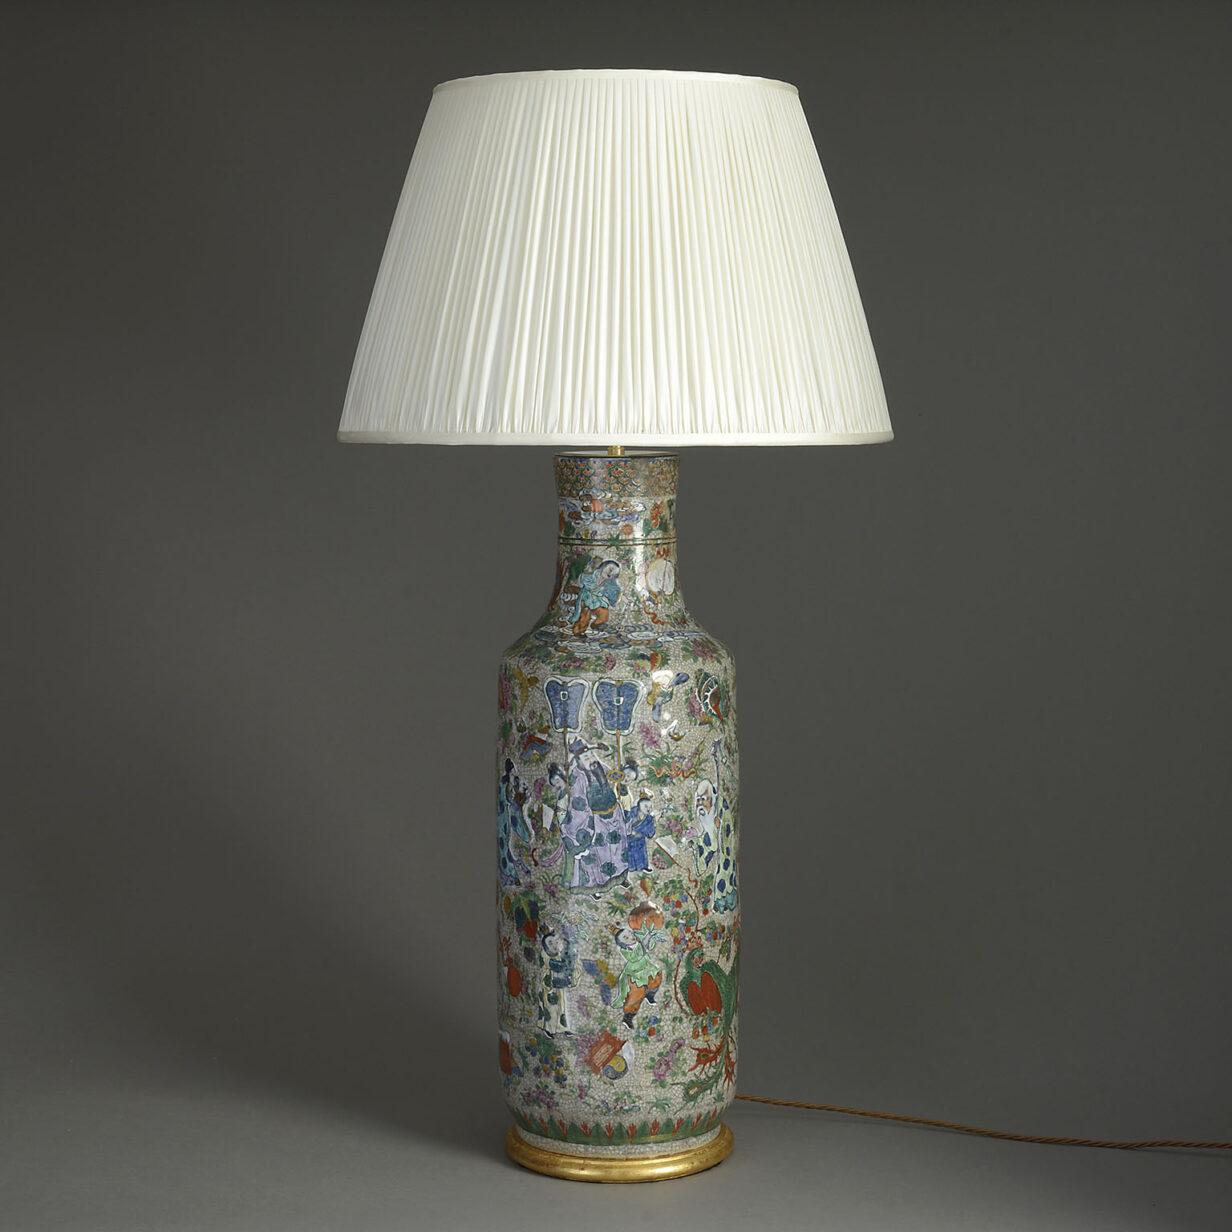 Crackle Glazed Vase Lamp